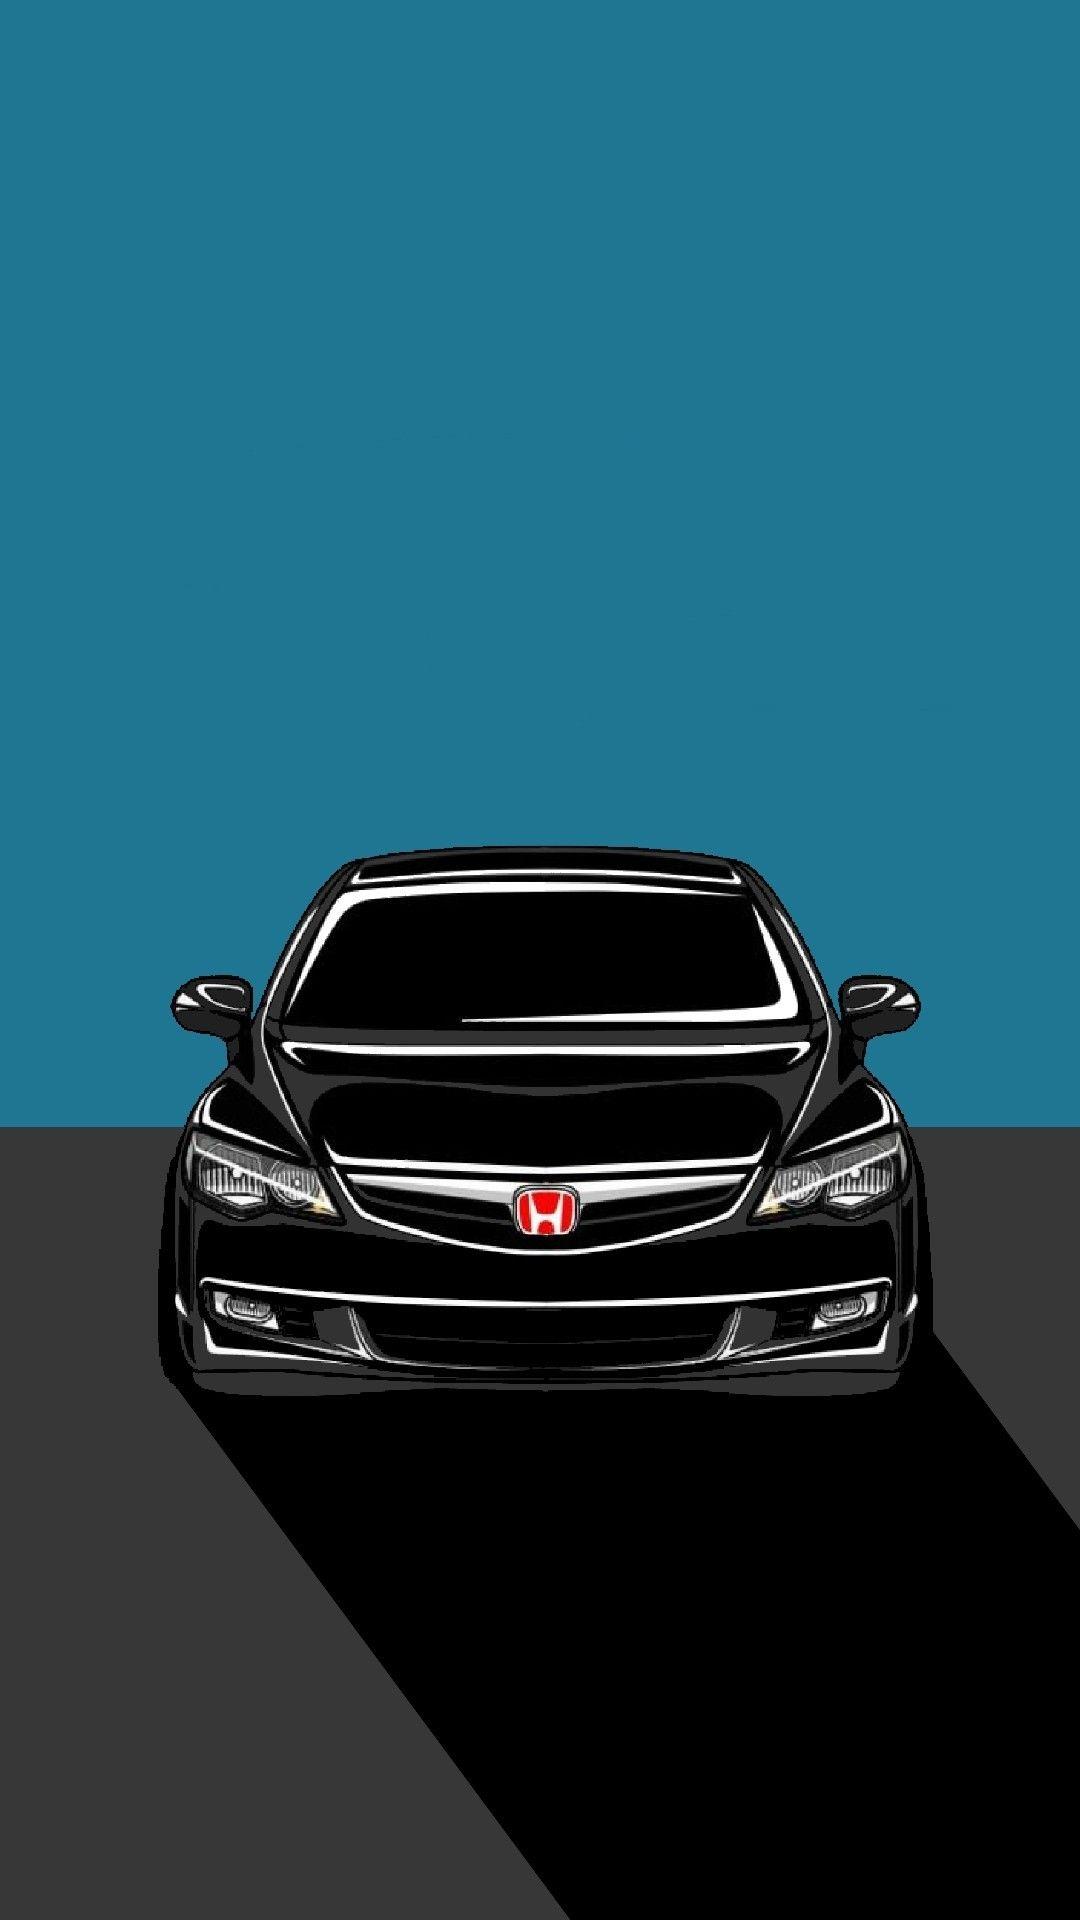 Pin Di Automotive